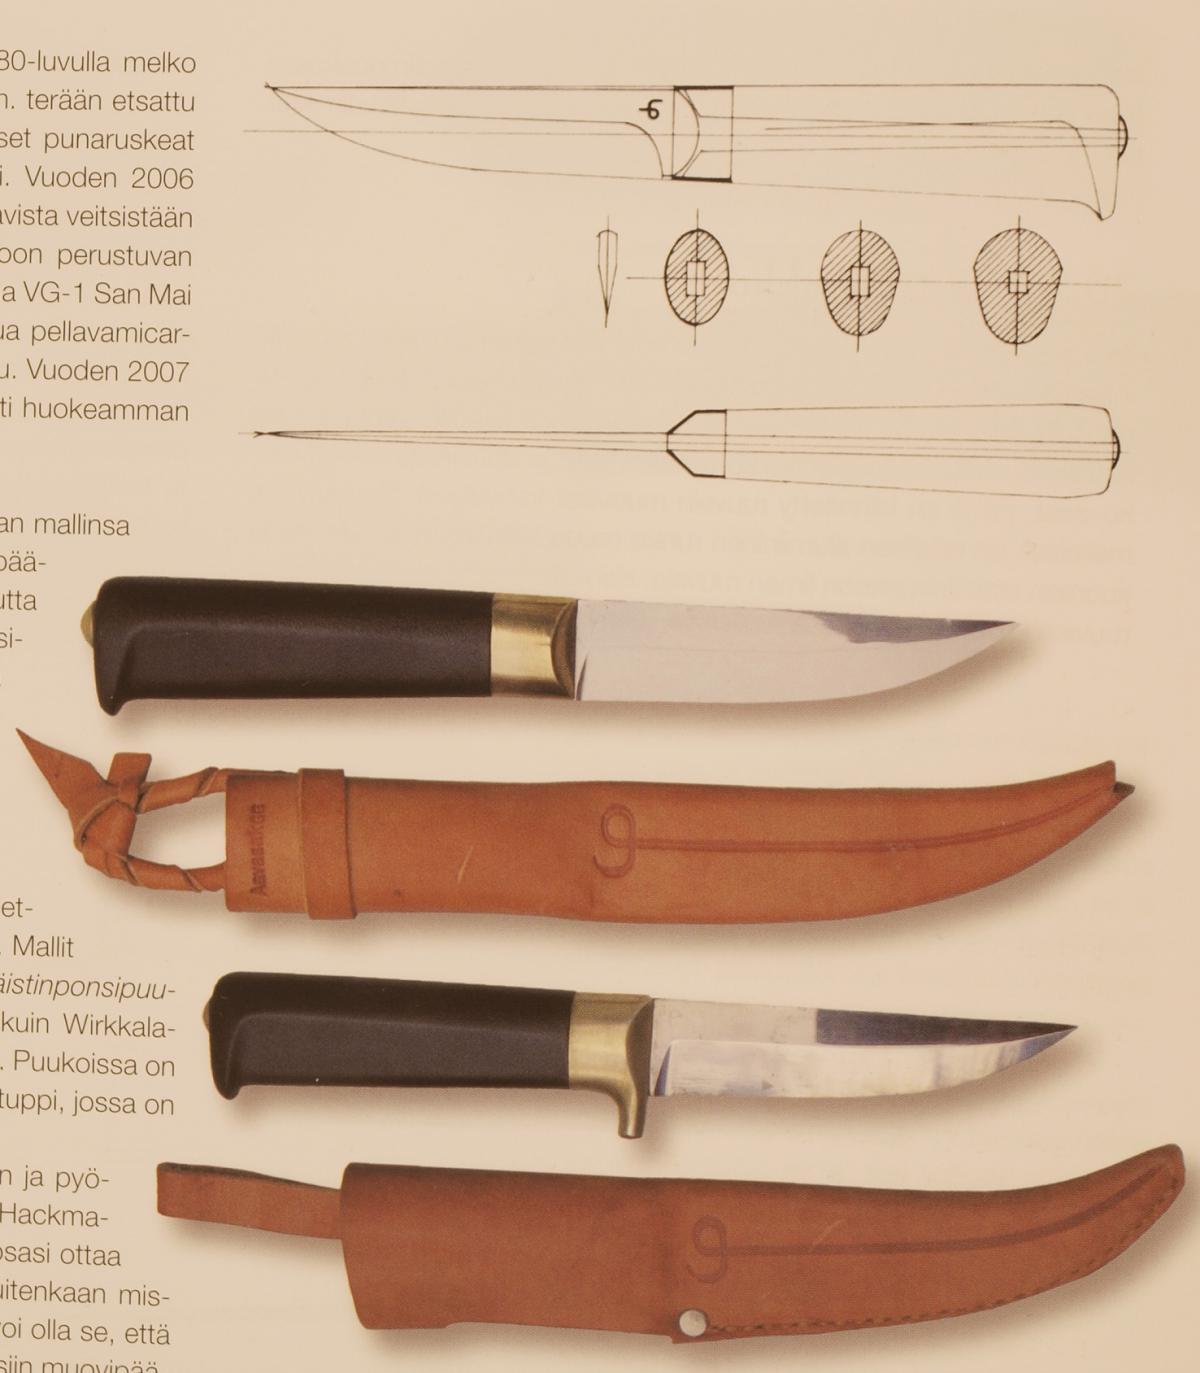 Ножи lapin puukko кузница назарова ножи